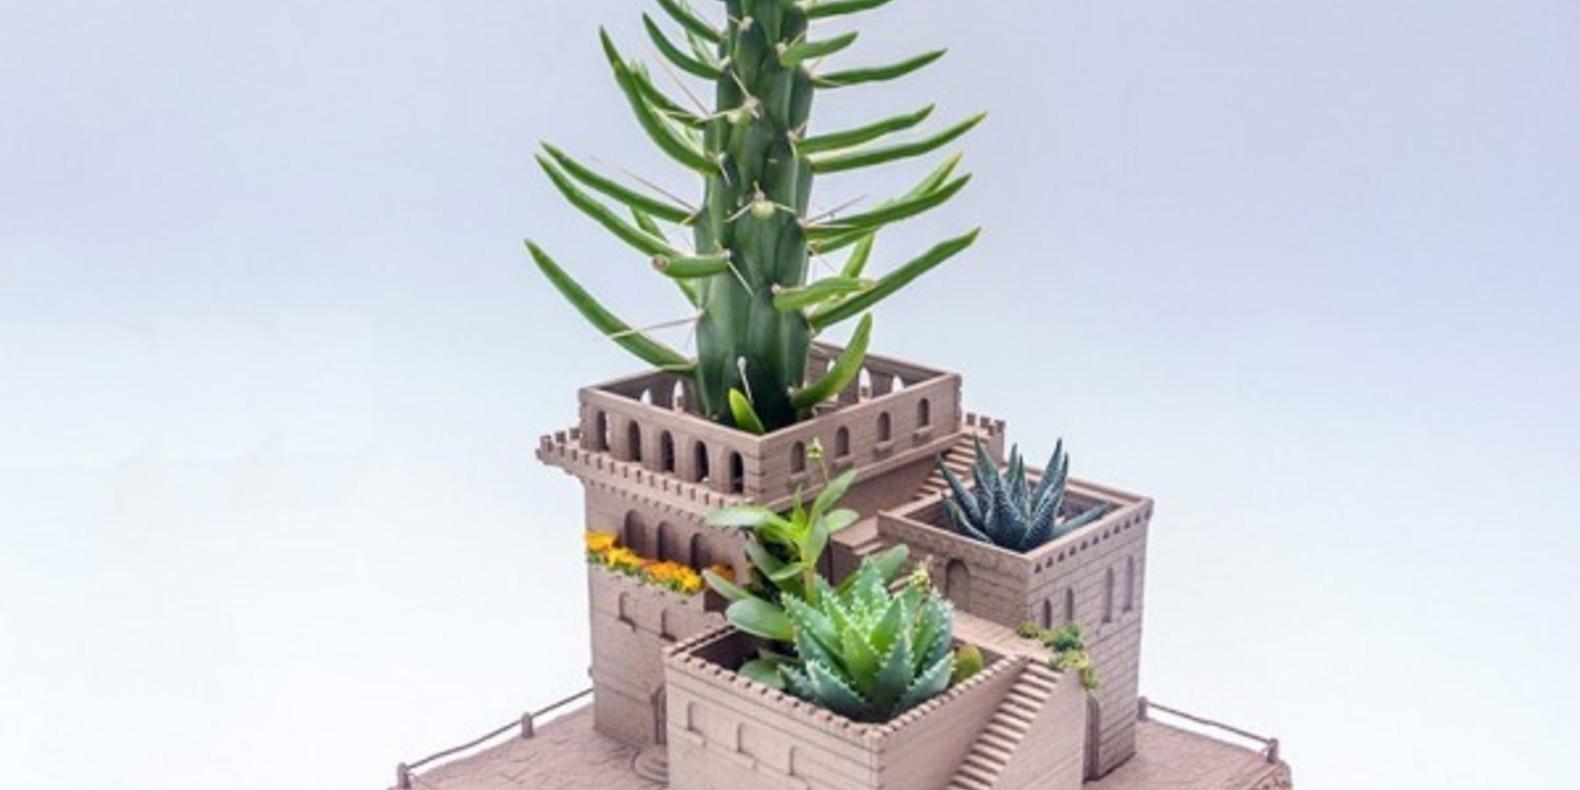 YURIYSKLYAR planter tinkercad makerbot fichier 3D cults 1